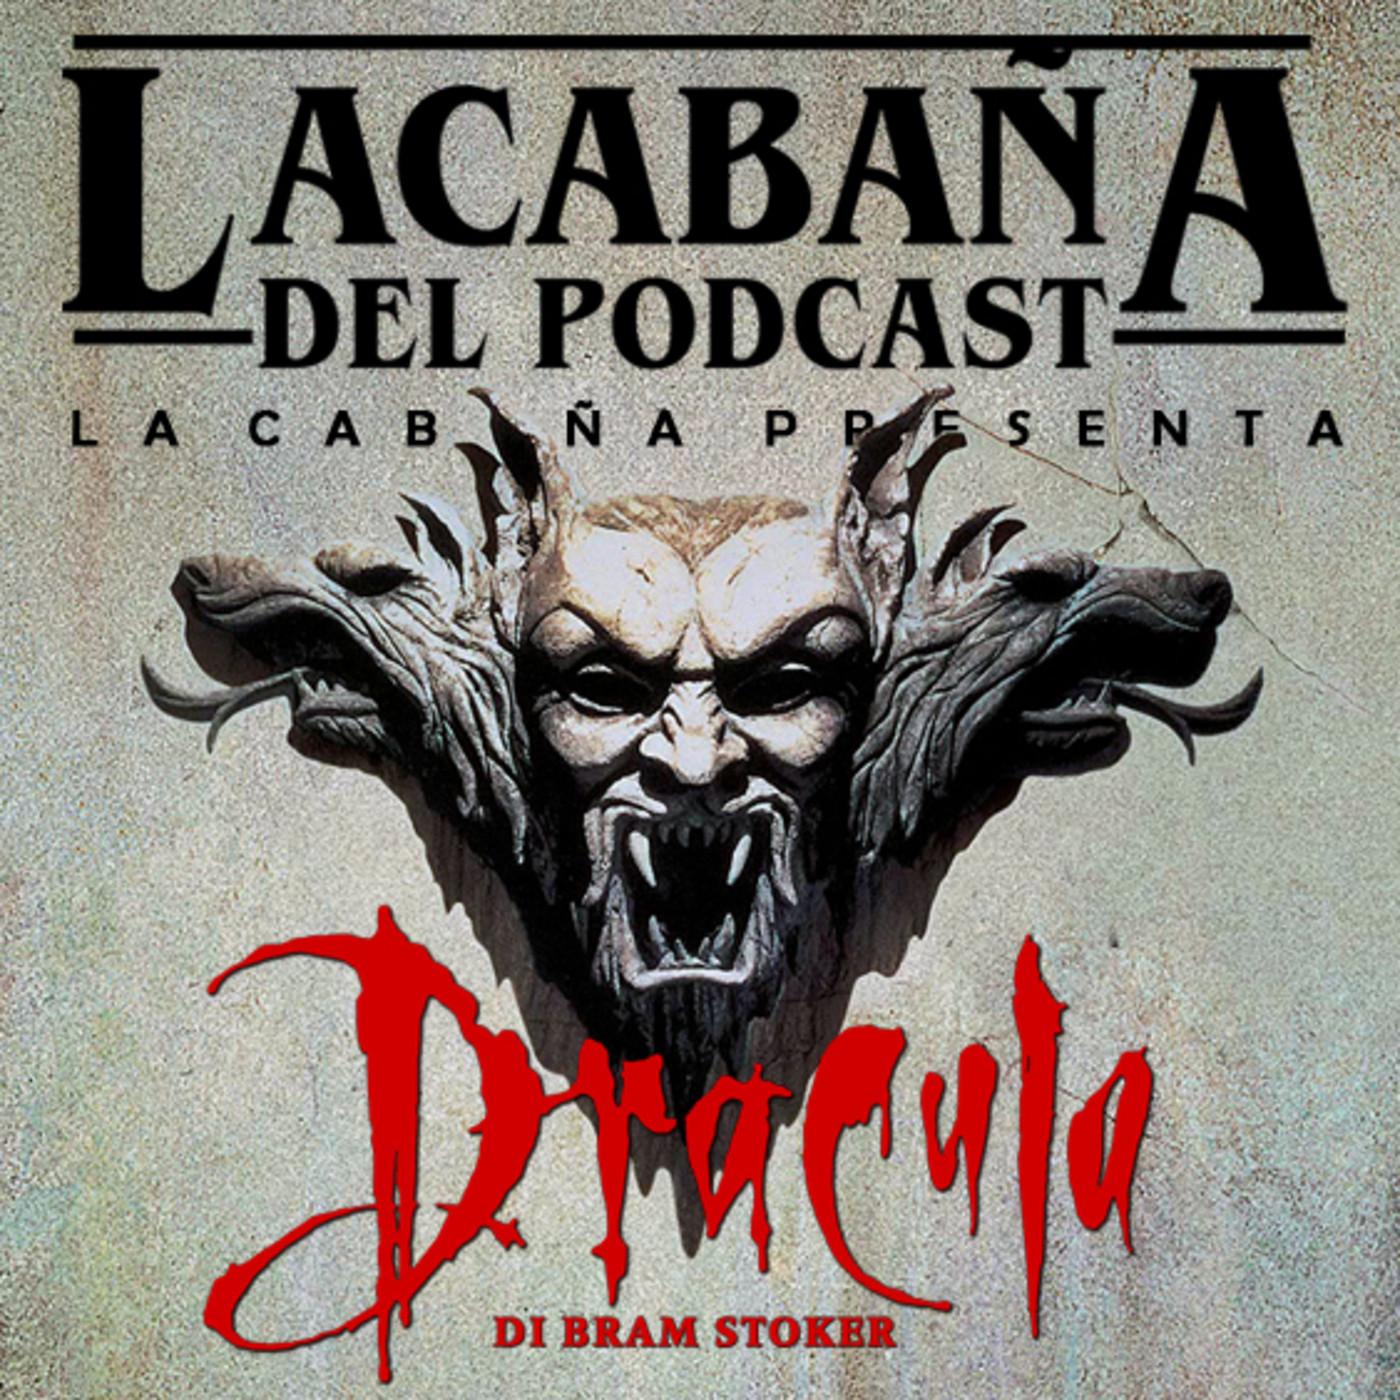 4x17 La Cabaña presenta: Dracula de Bram Stoker